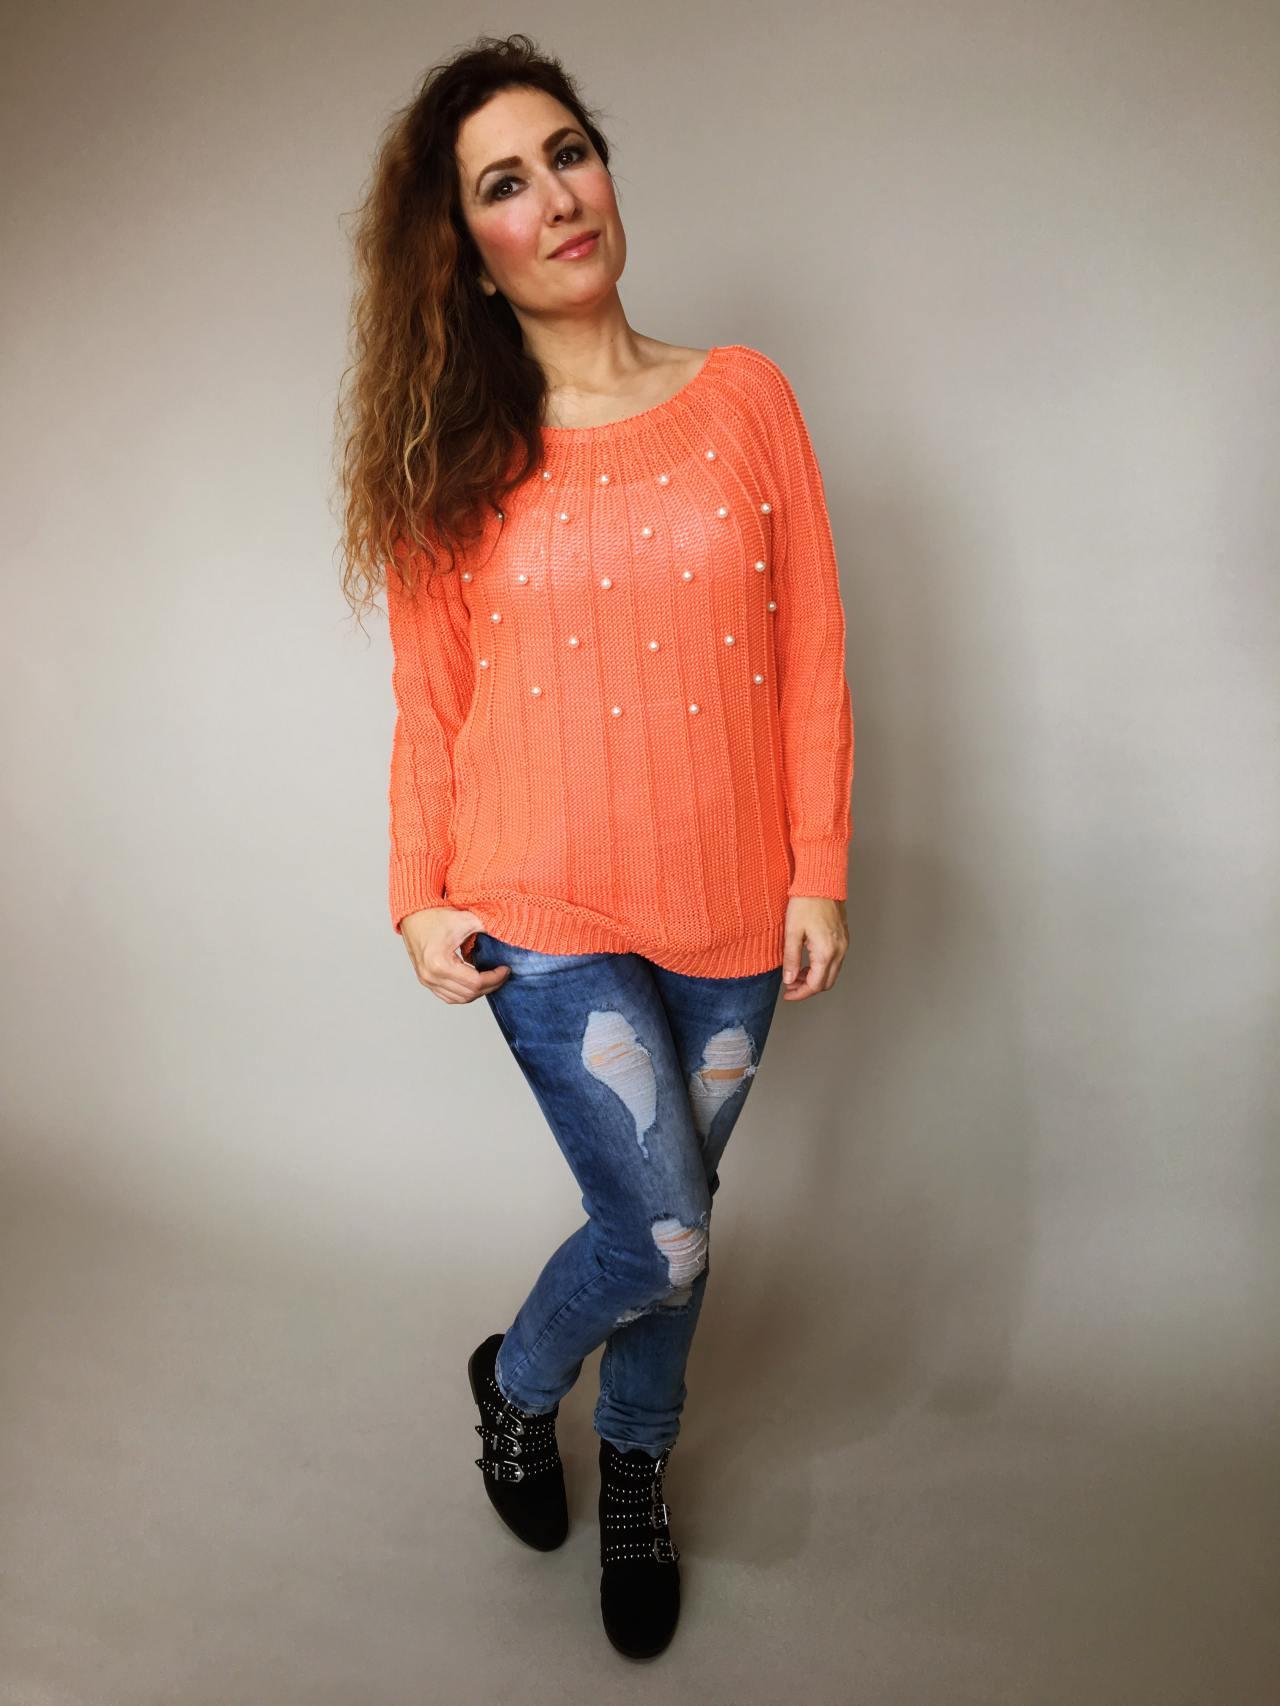 deeb9a887ea Halenka Pearls oranžová – Simm-Fashion.cz